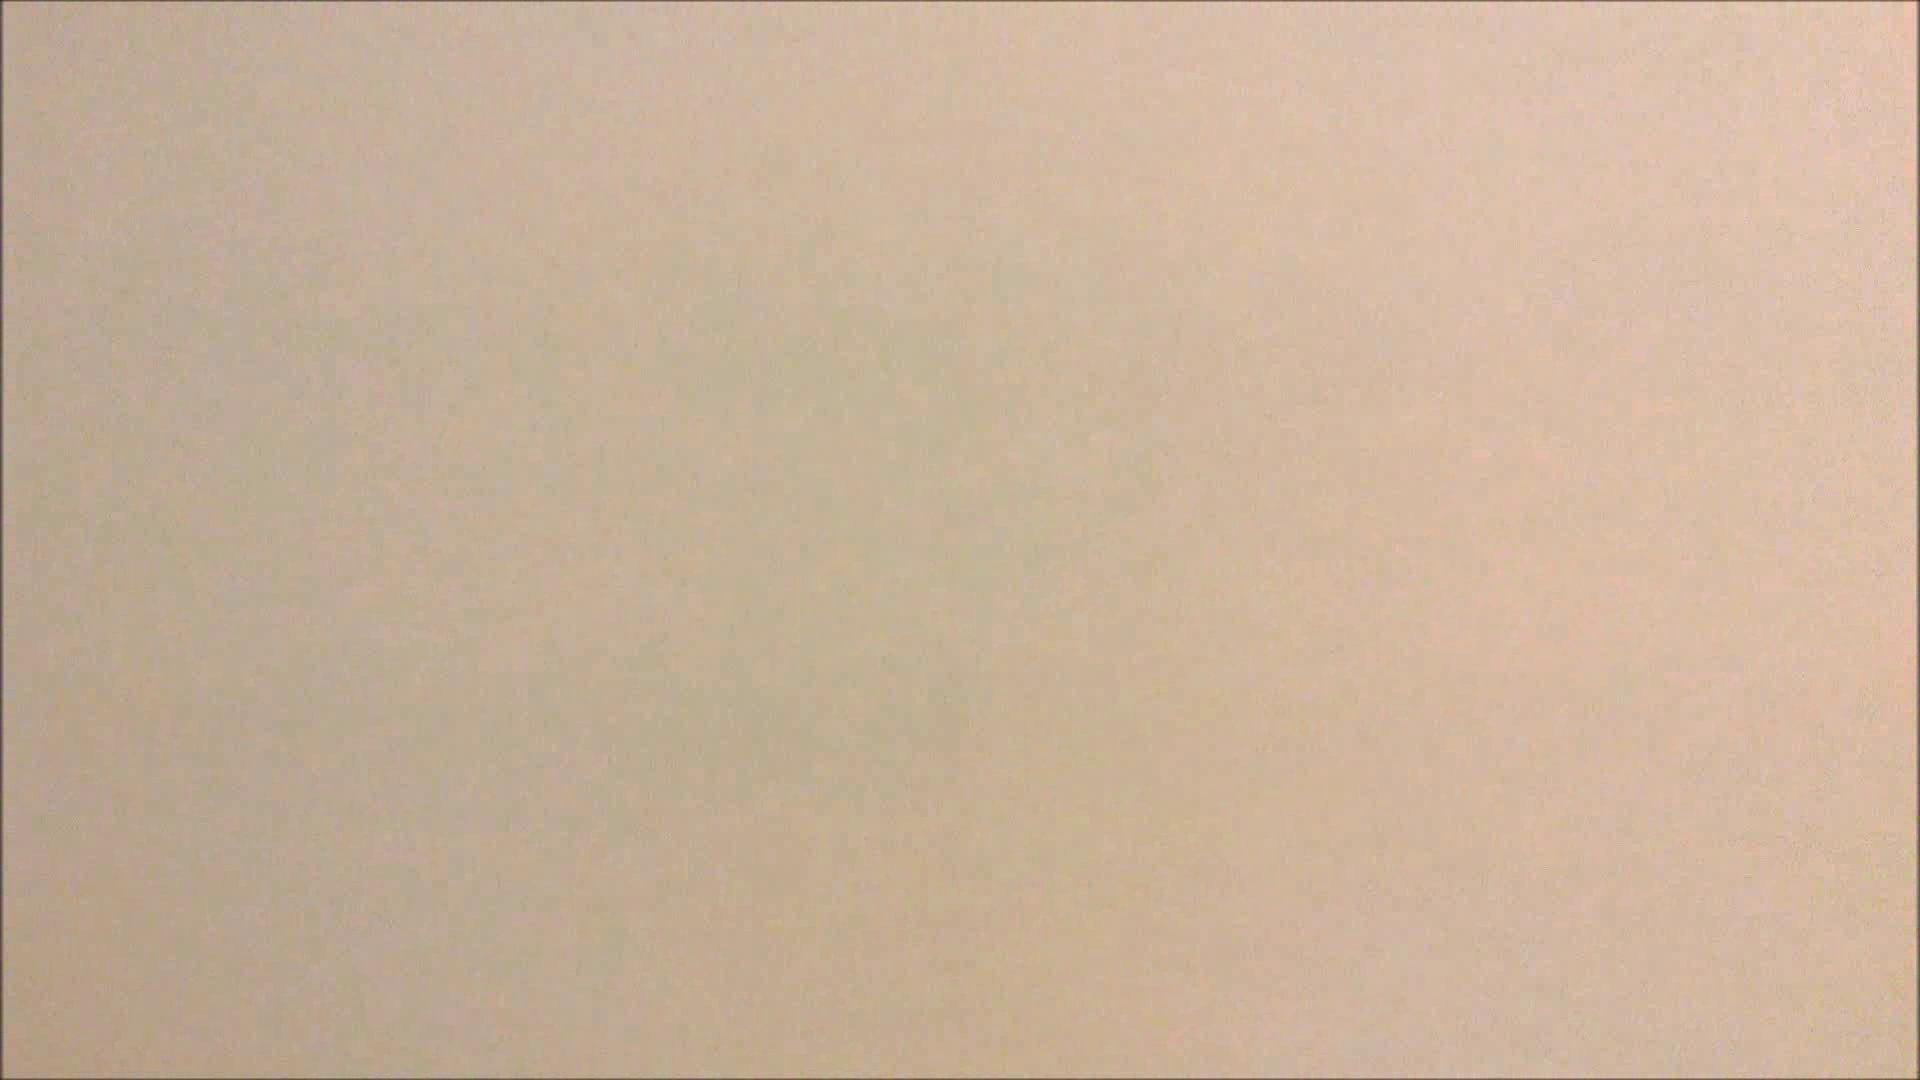 某有名大学女性洗面所 vol.14 和式 のぞき 105PIX 48